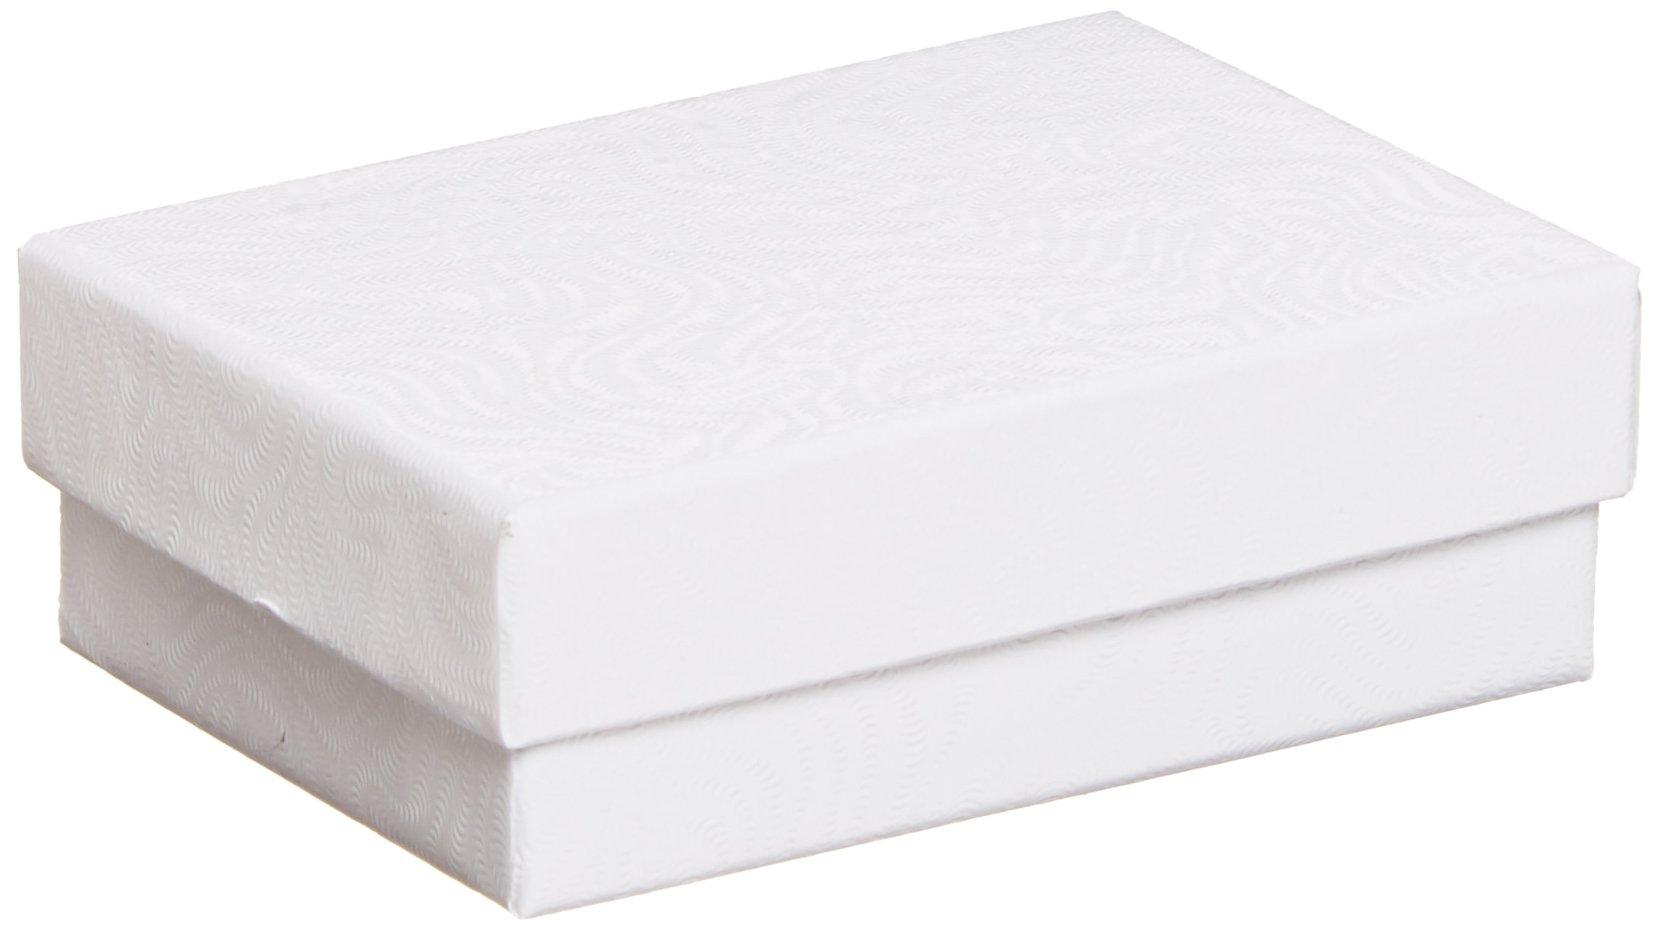 Aviditi JB321W Rigid Fiberboard Jewelry Box, 3-1/16'' Length x 2-1/8'' Width x 1'' Height, White (Case of 100)